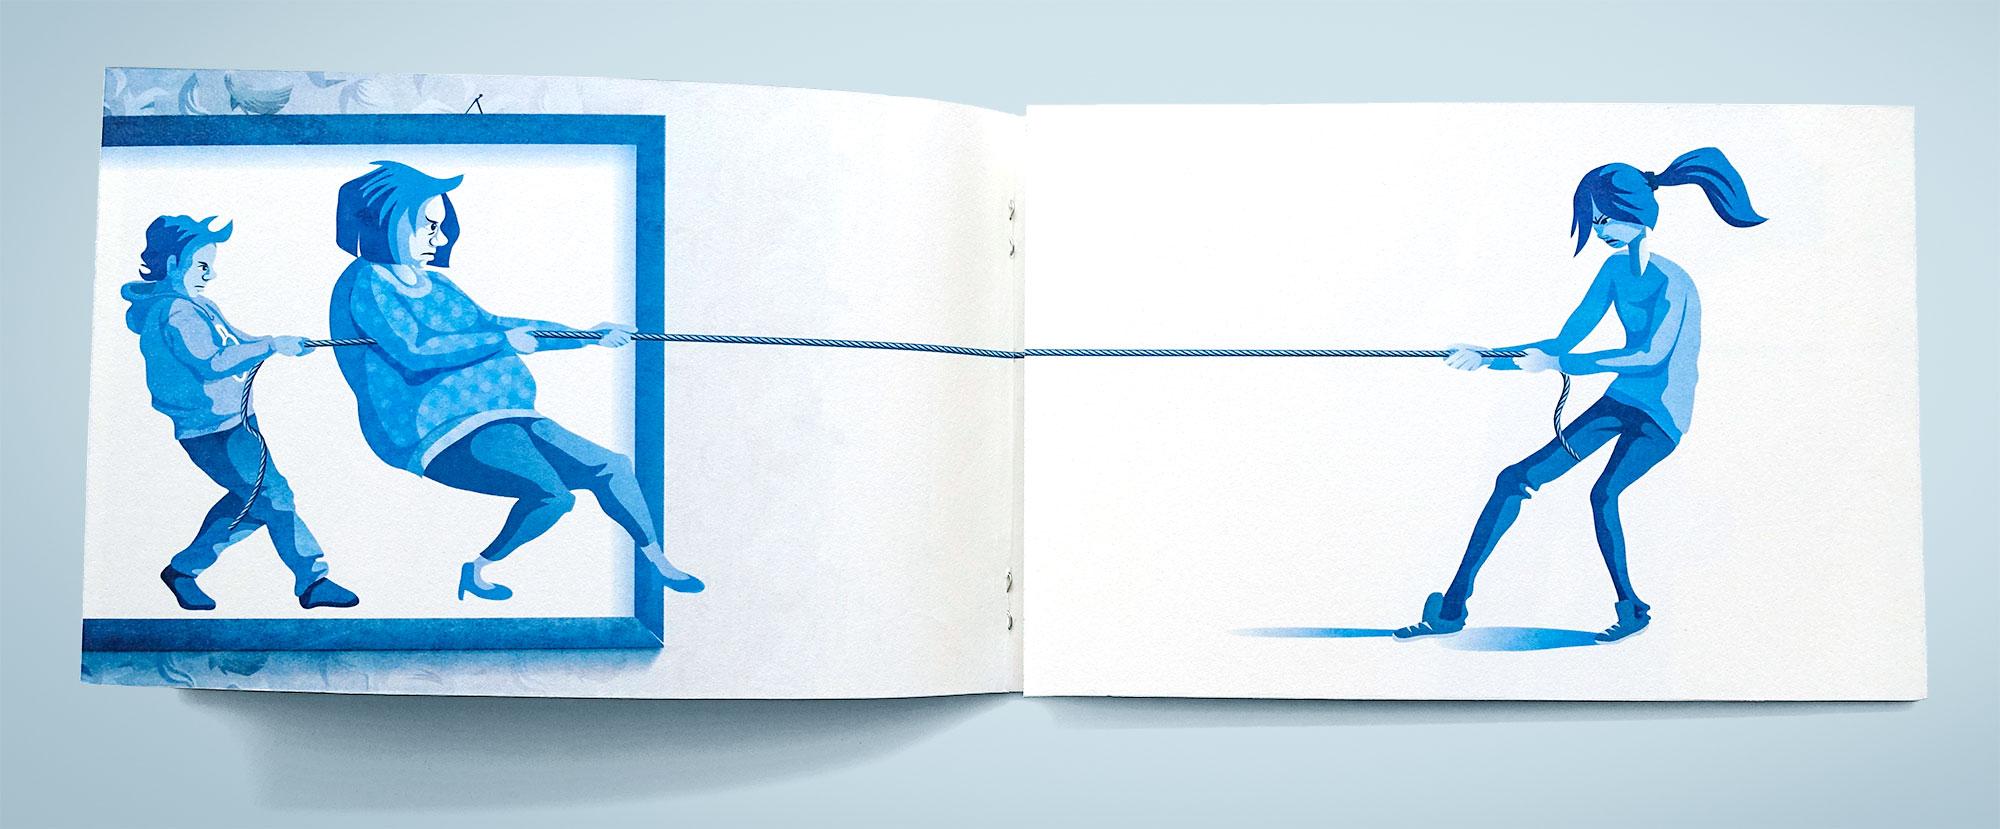 2_Seite18